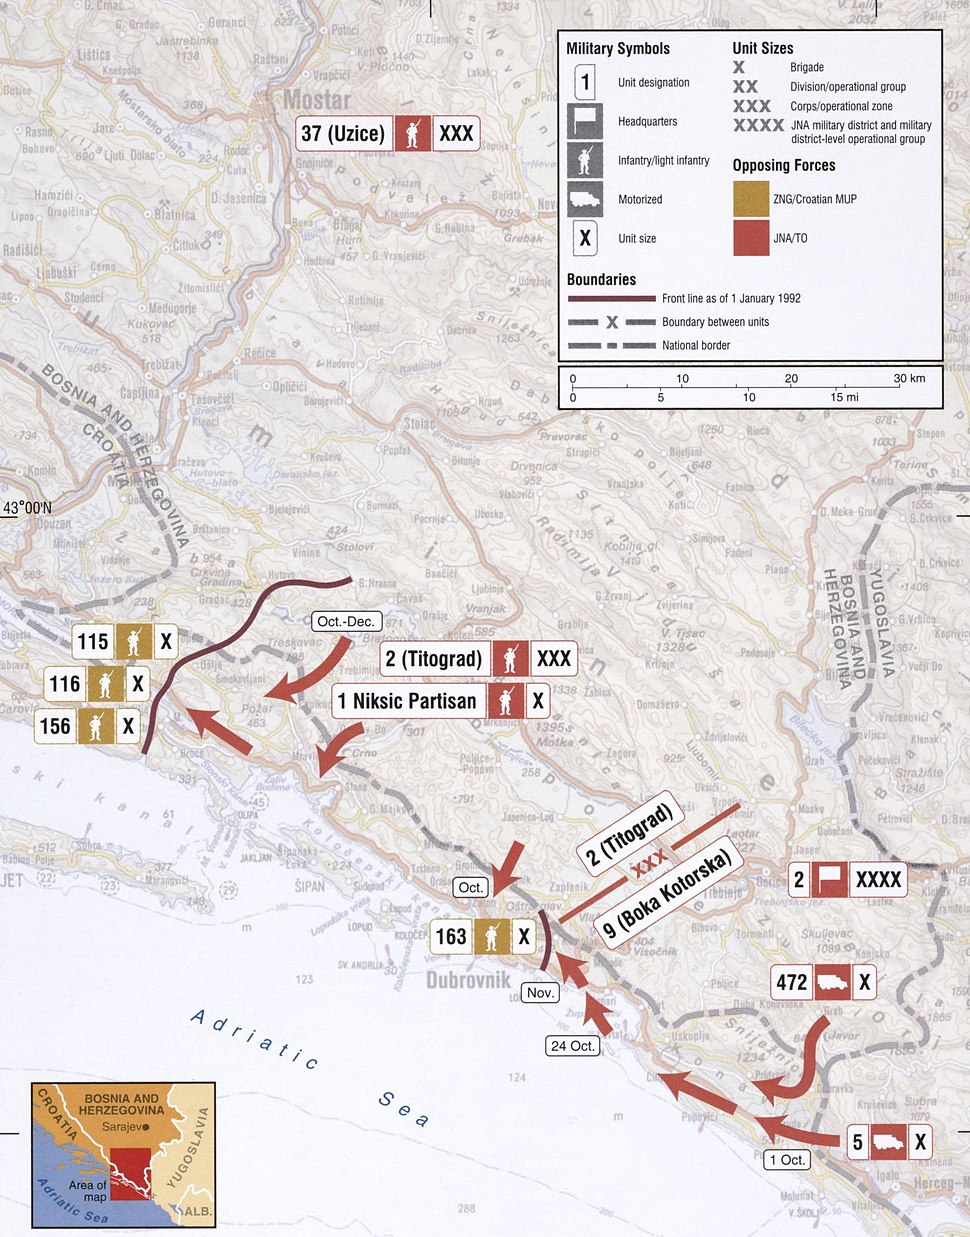 Map 7 - Croatia Dubrovnik - October 1991 - January 1992